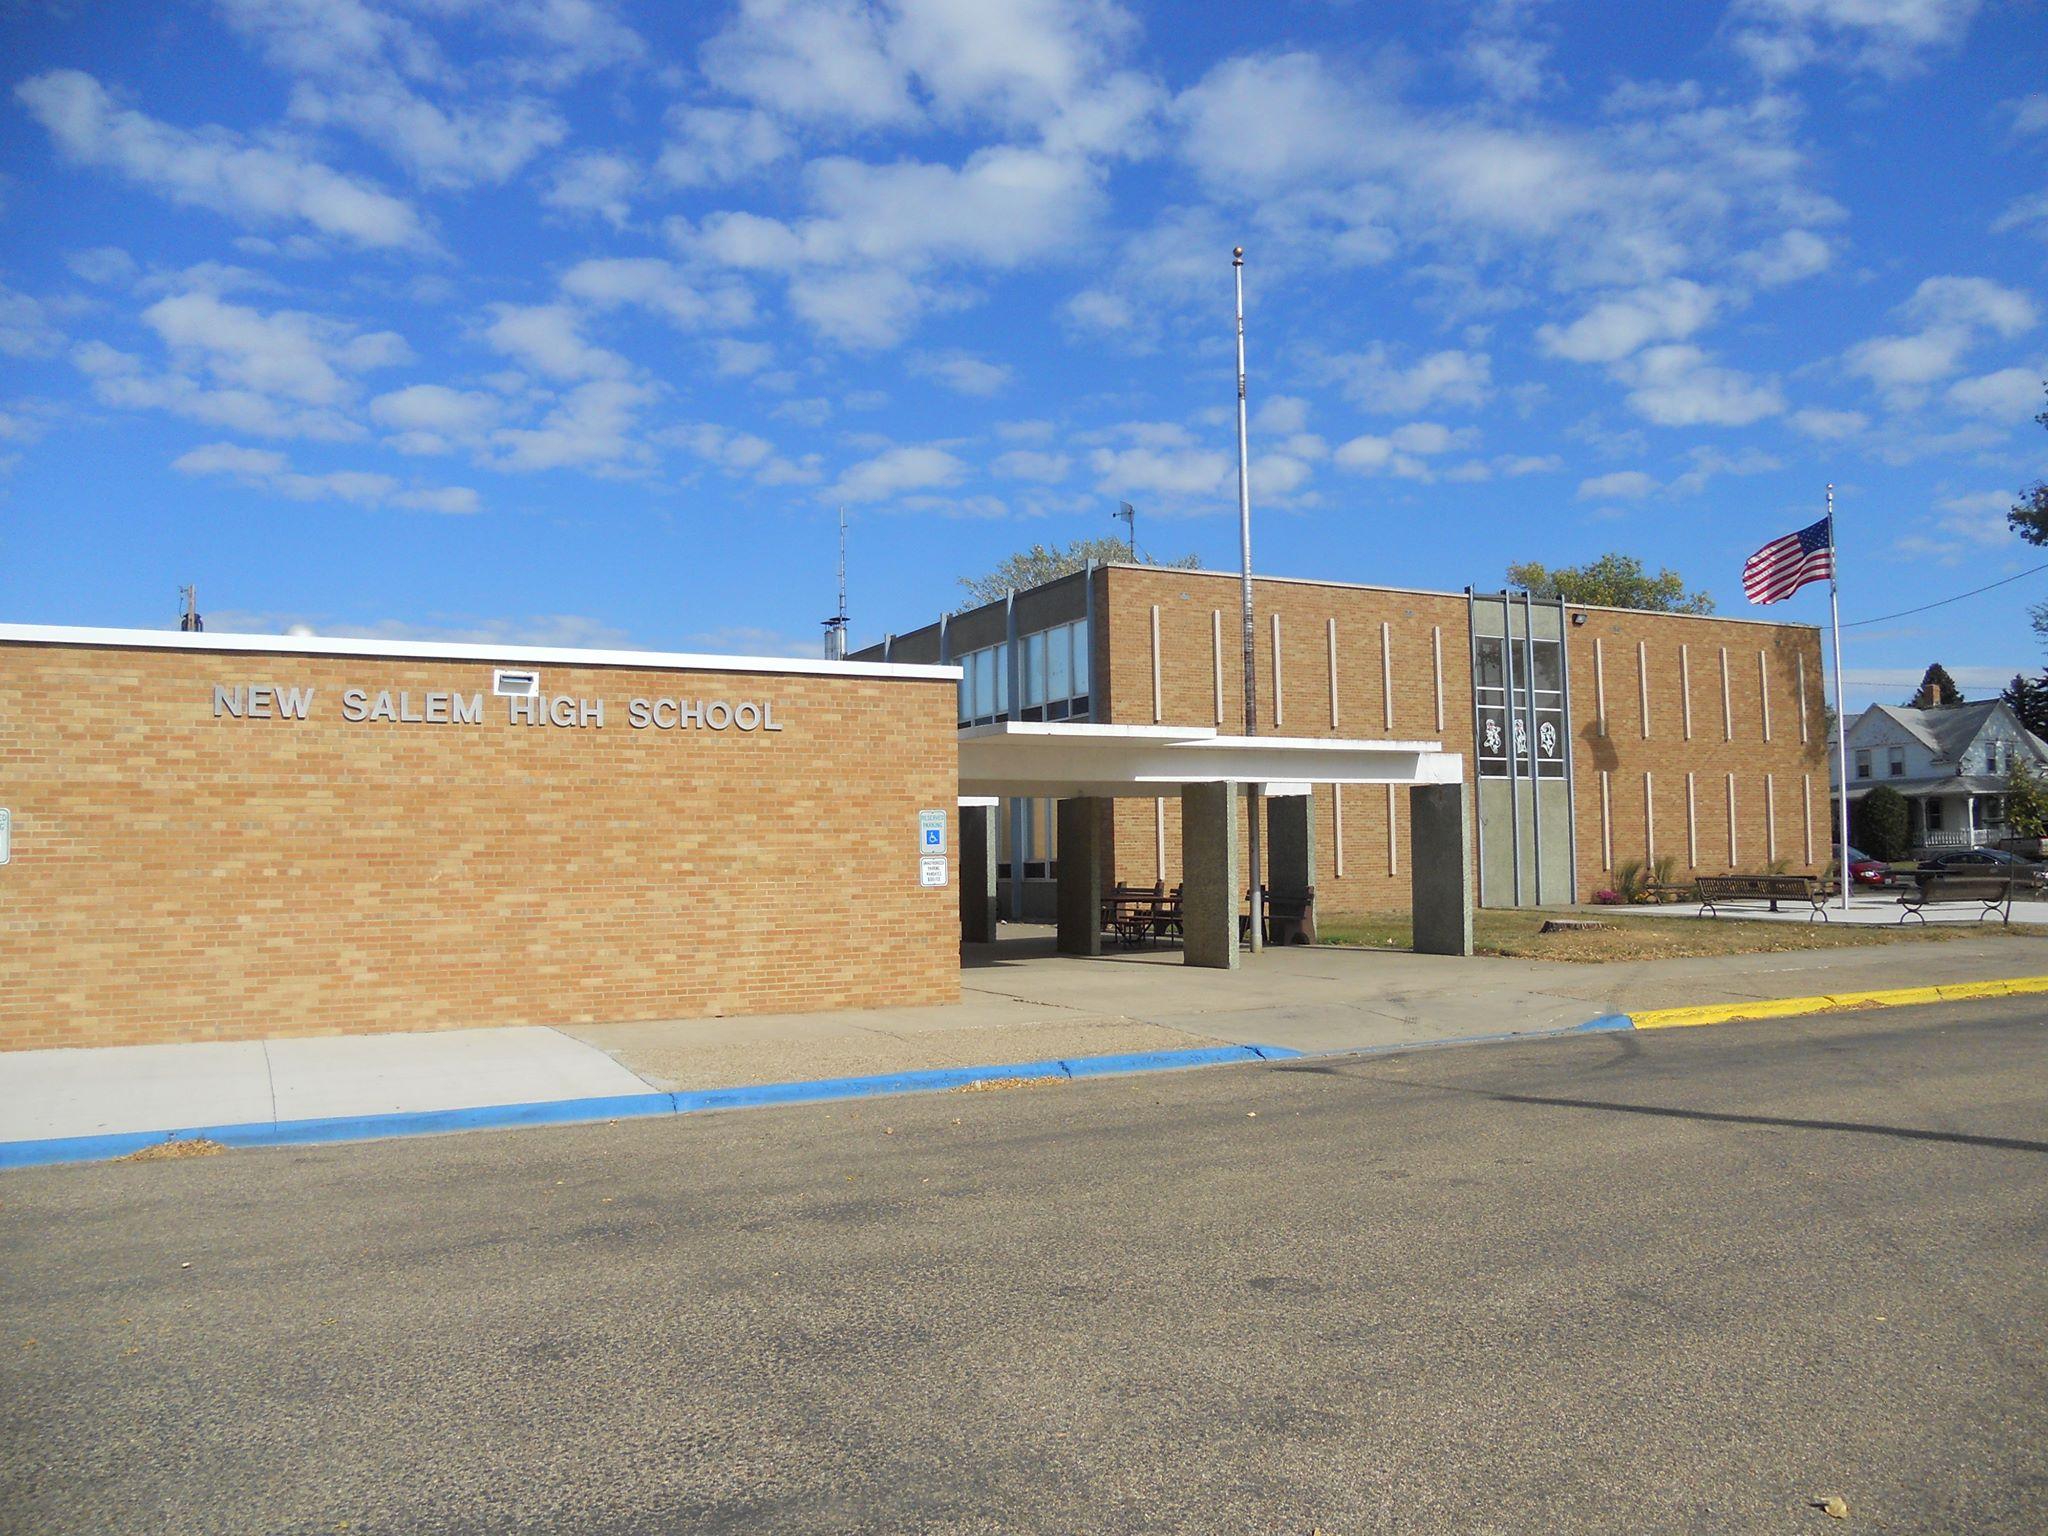 New Salem high school campus